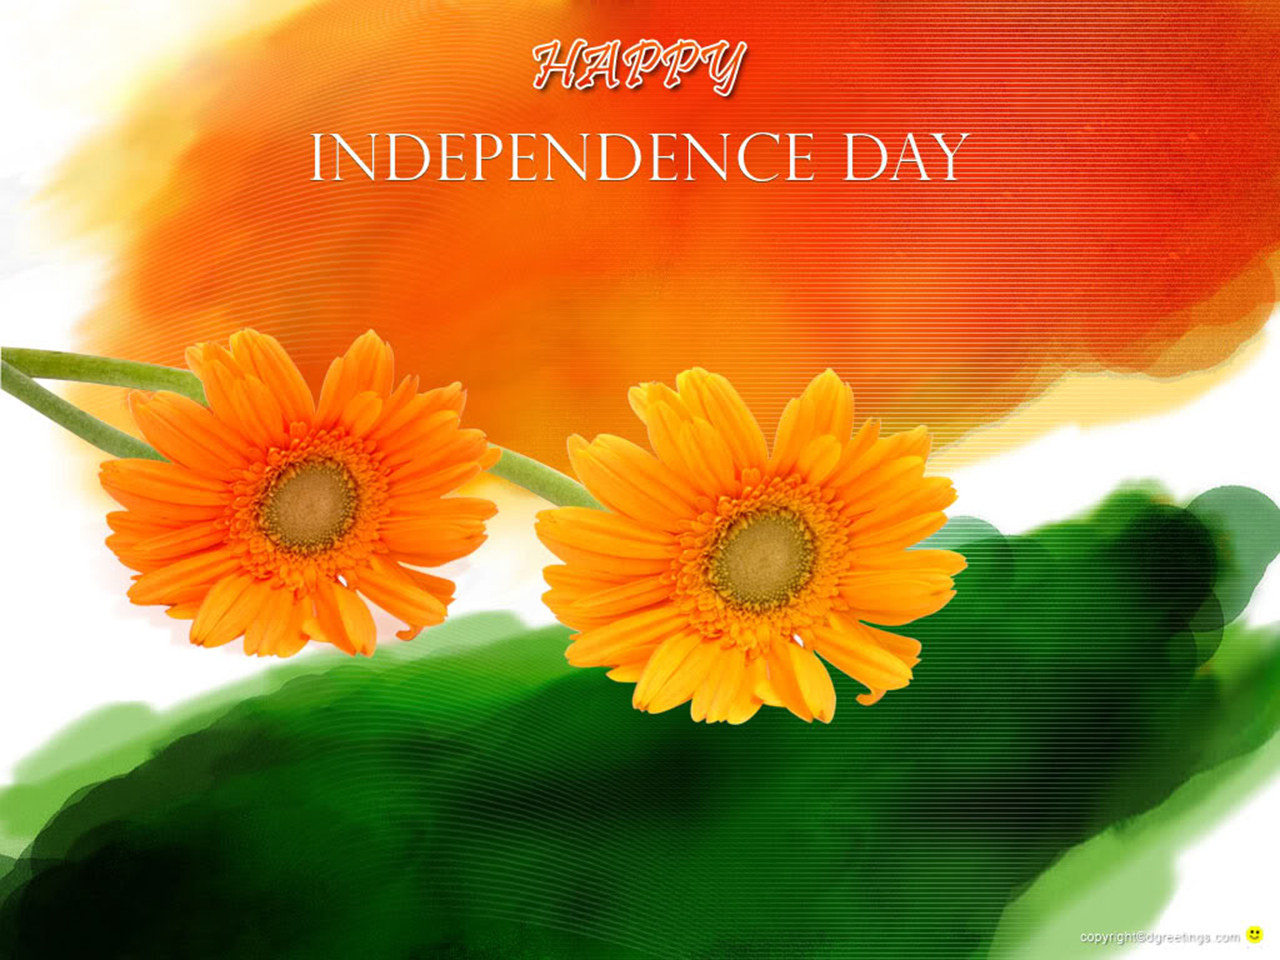 http://2.bp.blogspot.com/-wOv5Gi-pXvQ/TkjGNChT-AI/AAAAAAAAATo/xKnVq1rHRPE/s1600/independence-day-wallpaper-4.jpg